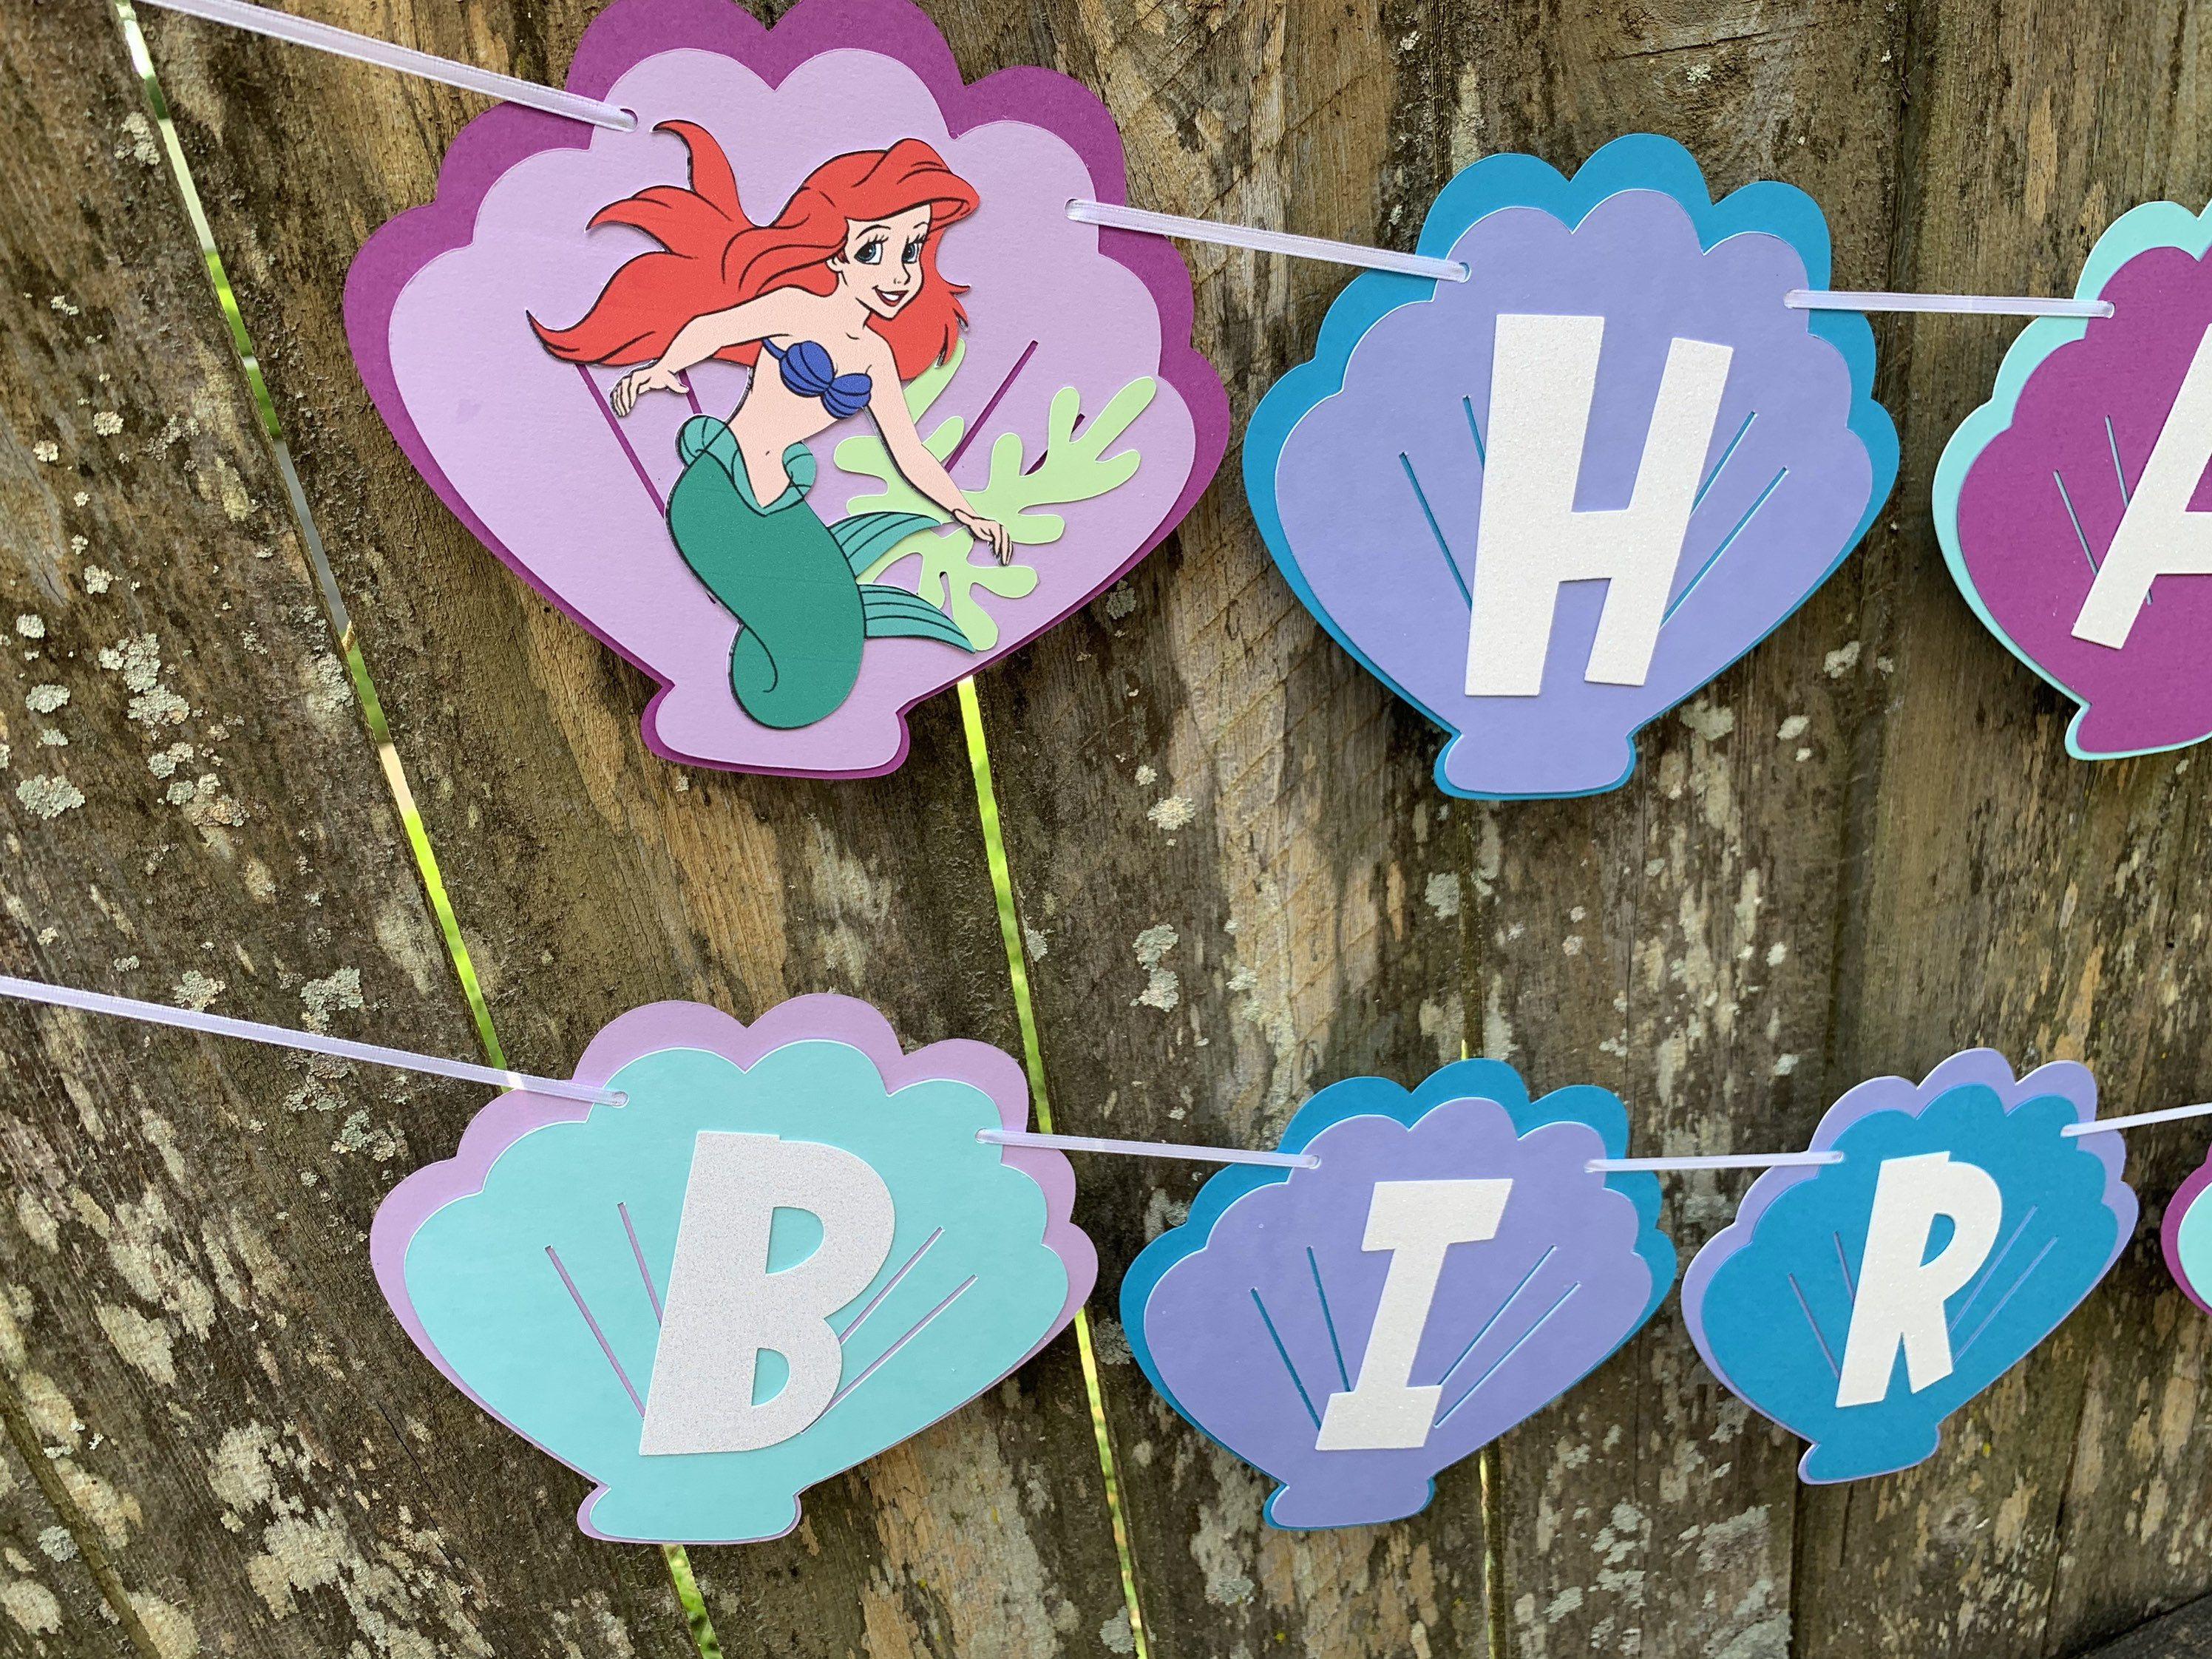 under the sea Ariel Little mermaid inspired birthday banner Little Mermaid Birthday Banner Little Mermaid Birthday Party decorations